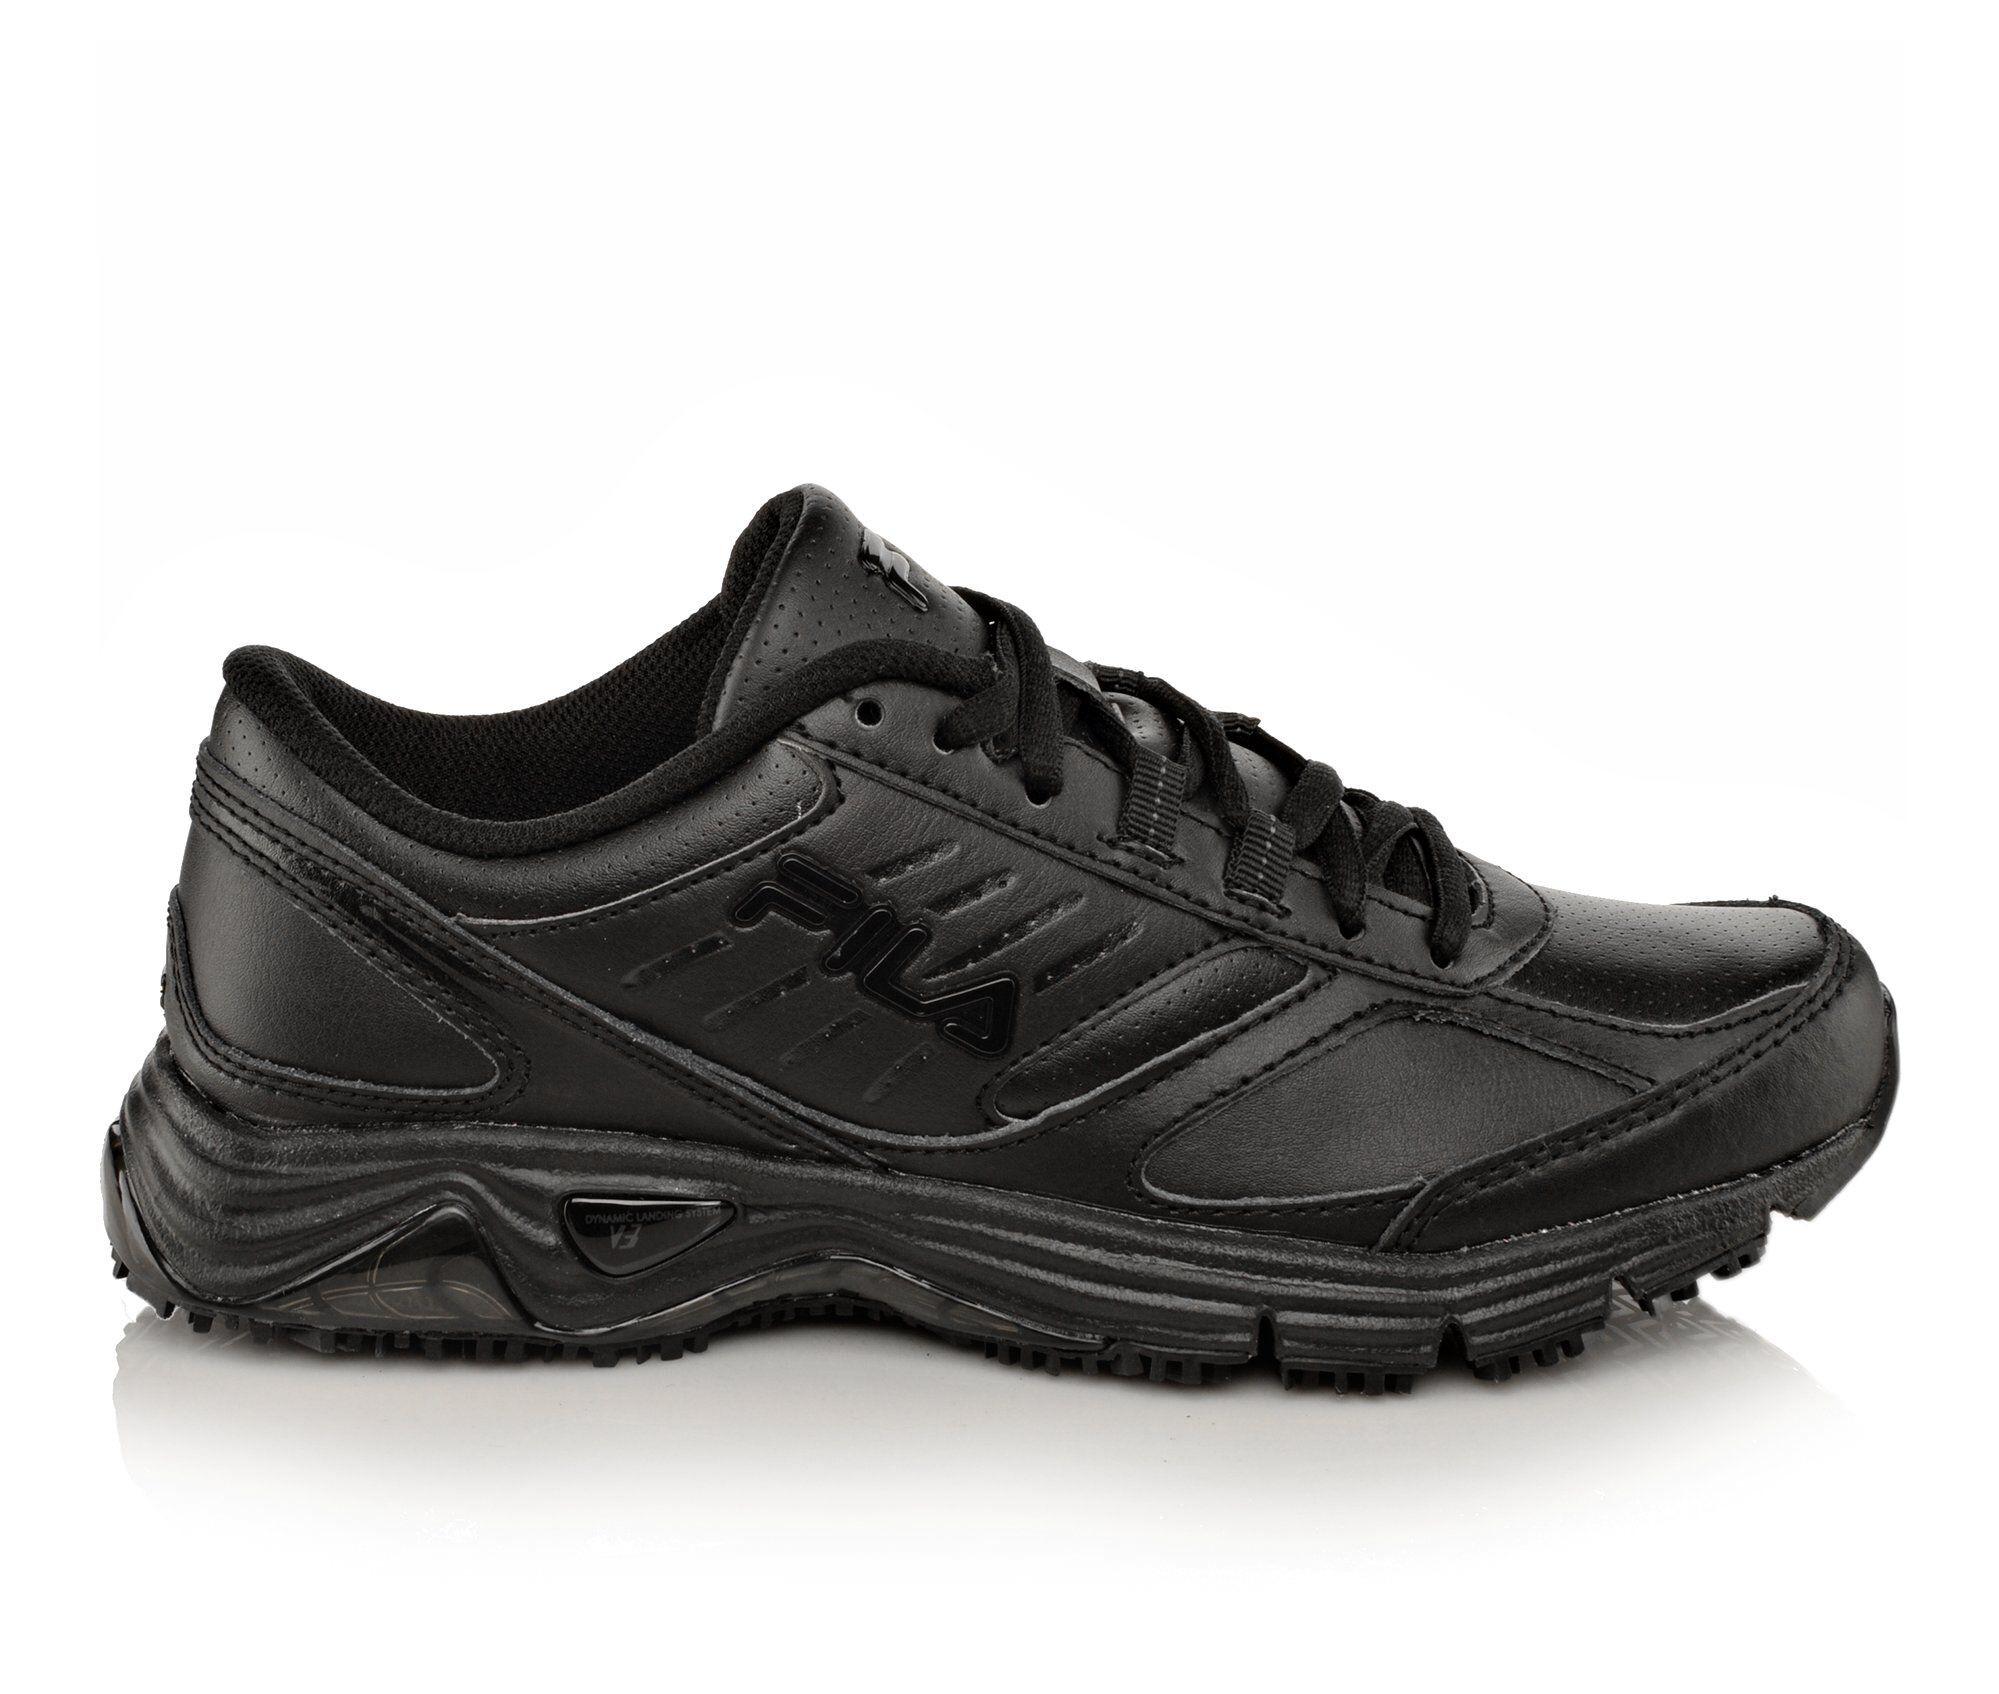 fila memory flux slip resistant safety shoes